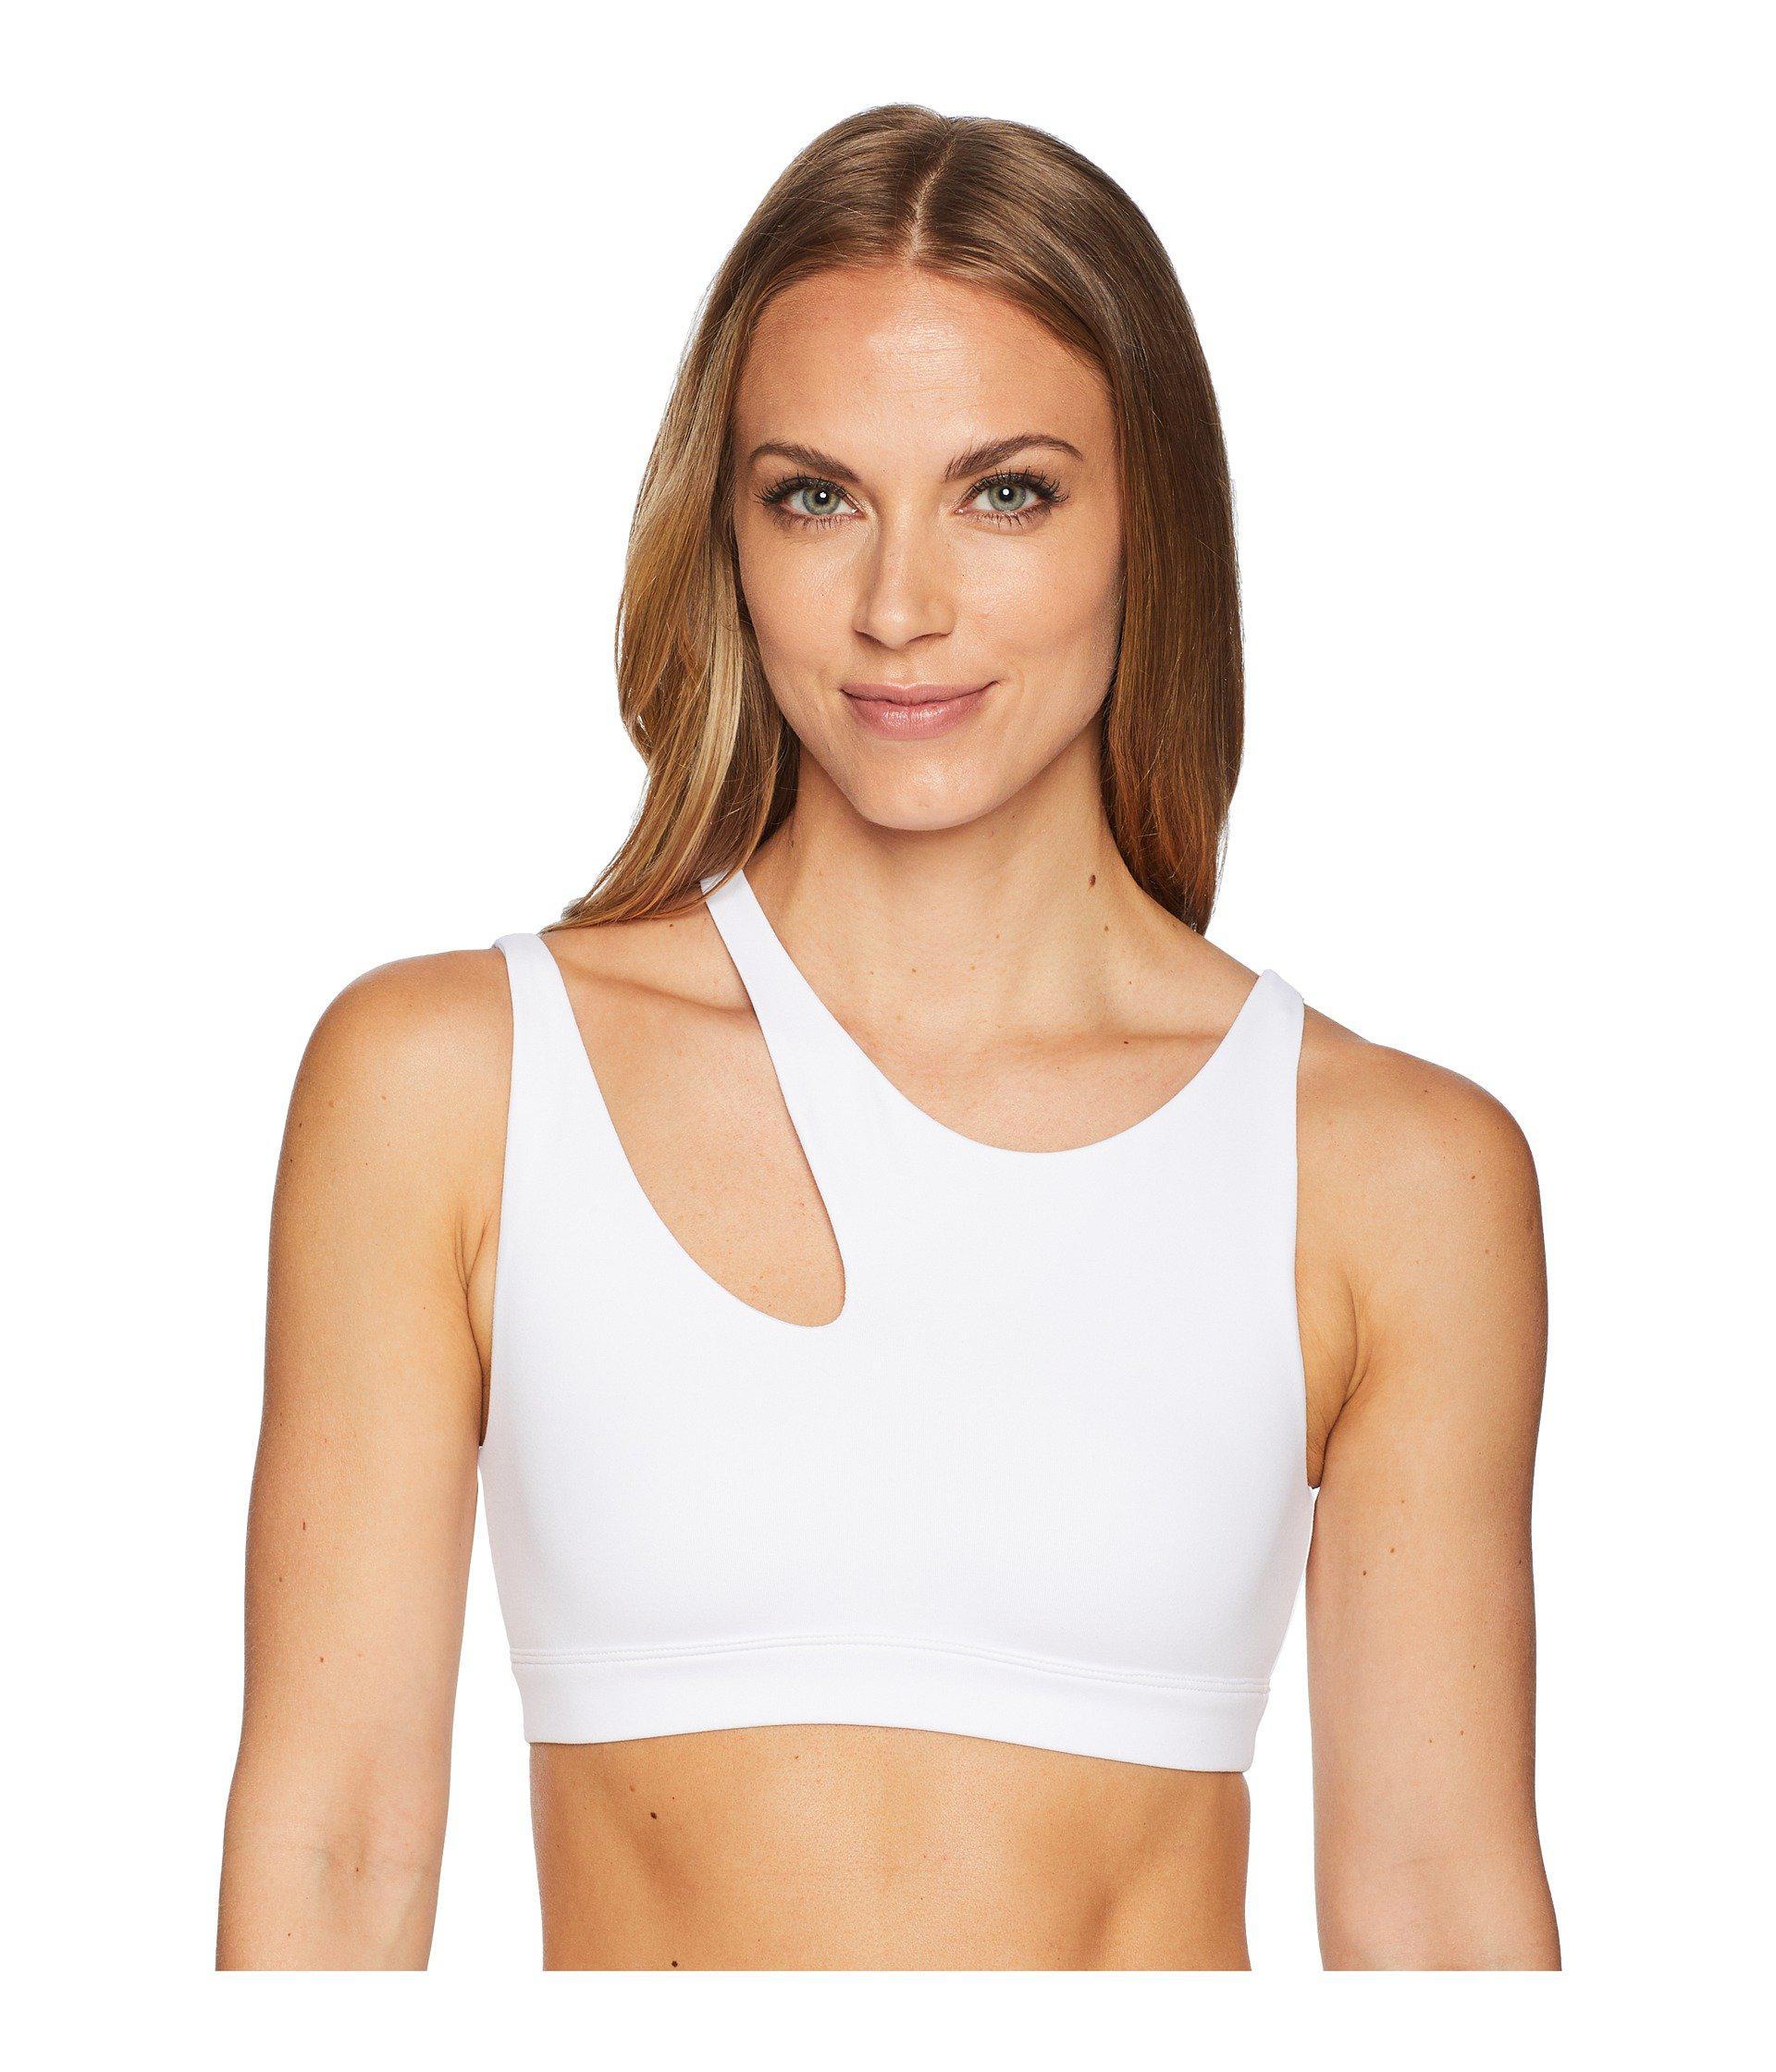 3032c8e1d52e1 Lyst - Alo Yoga Peak Bra (white) Women s Bra in White